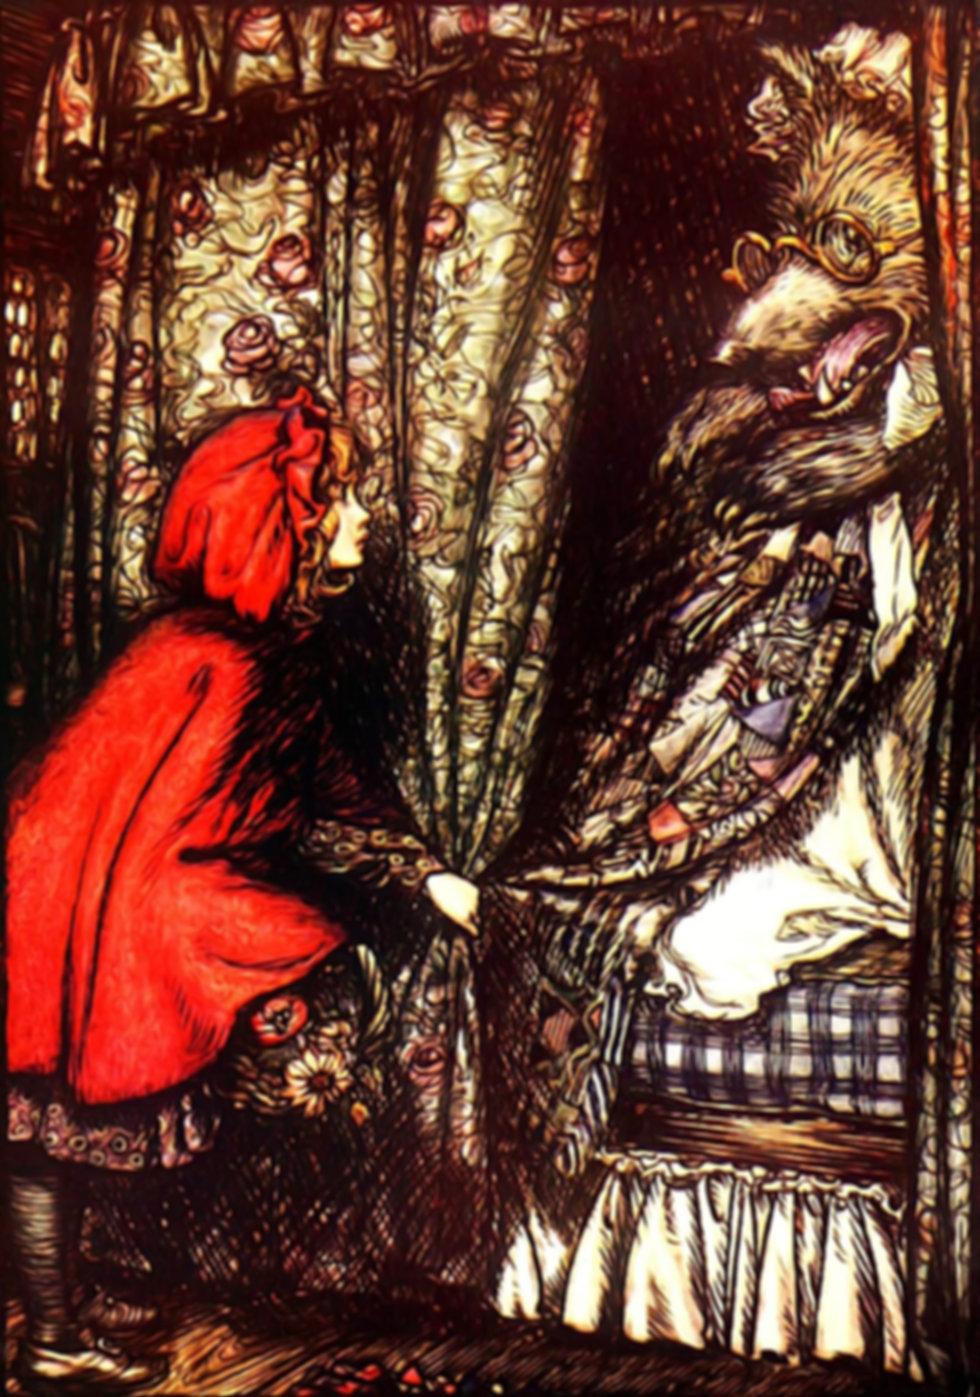 fairytale red riding hood arthur rackham story medicine